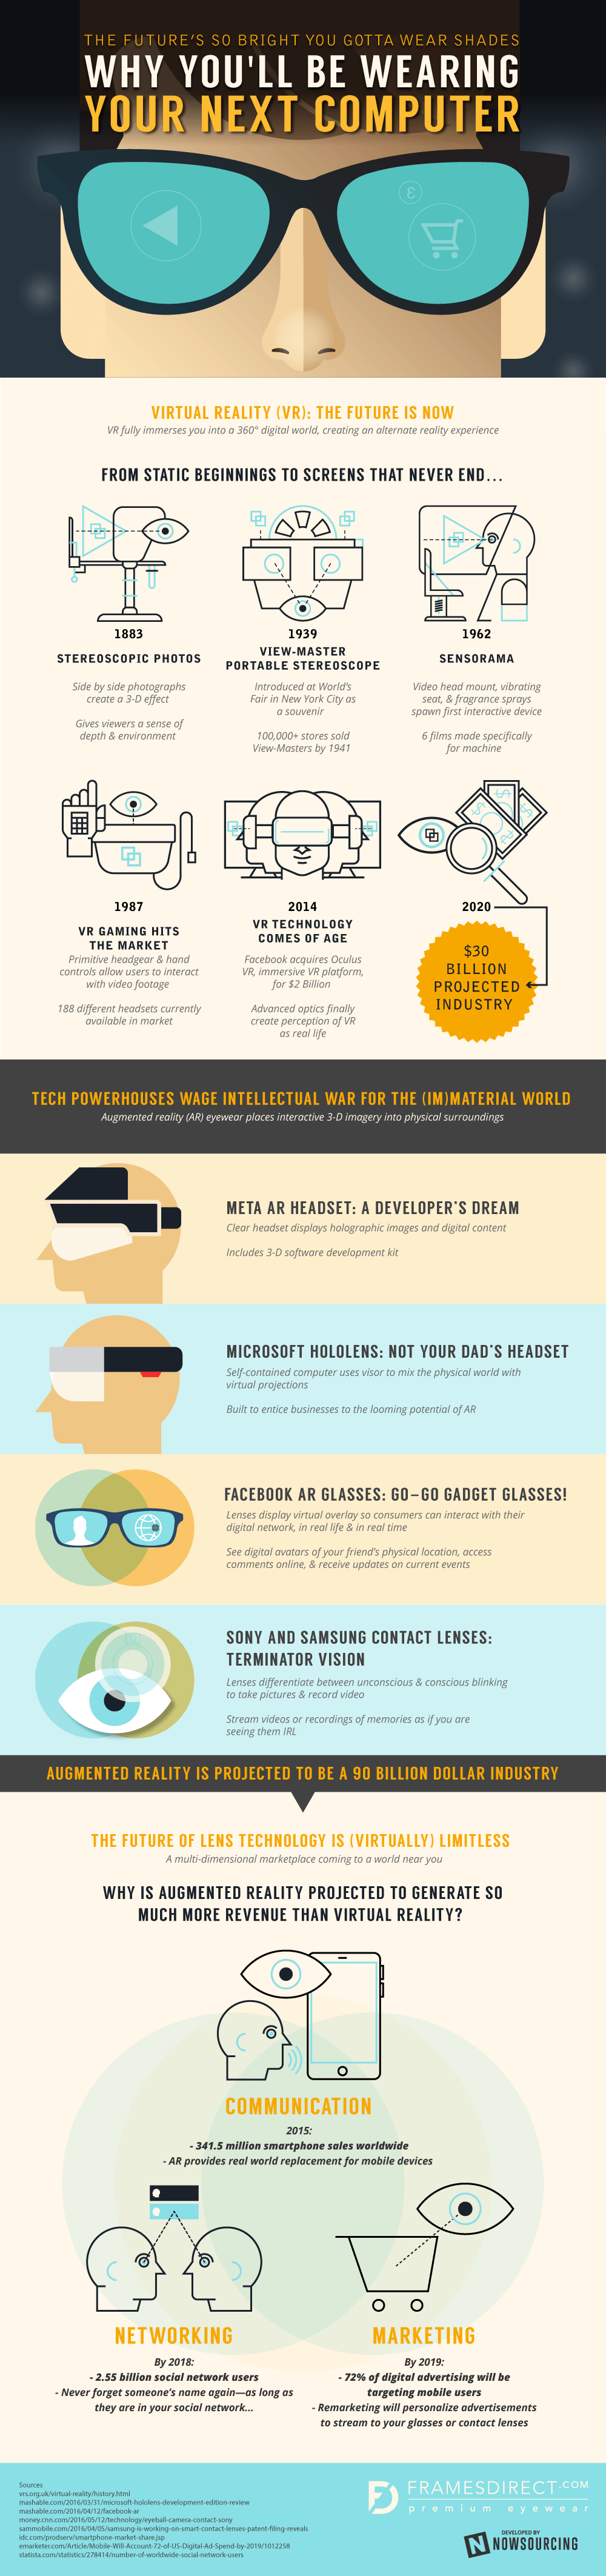 frames-direct-lp-virtual-reality-glasses